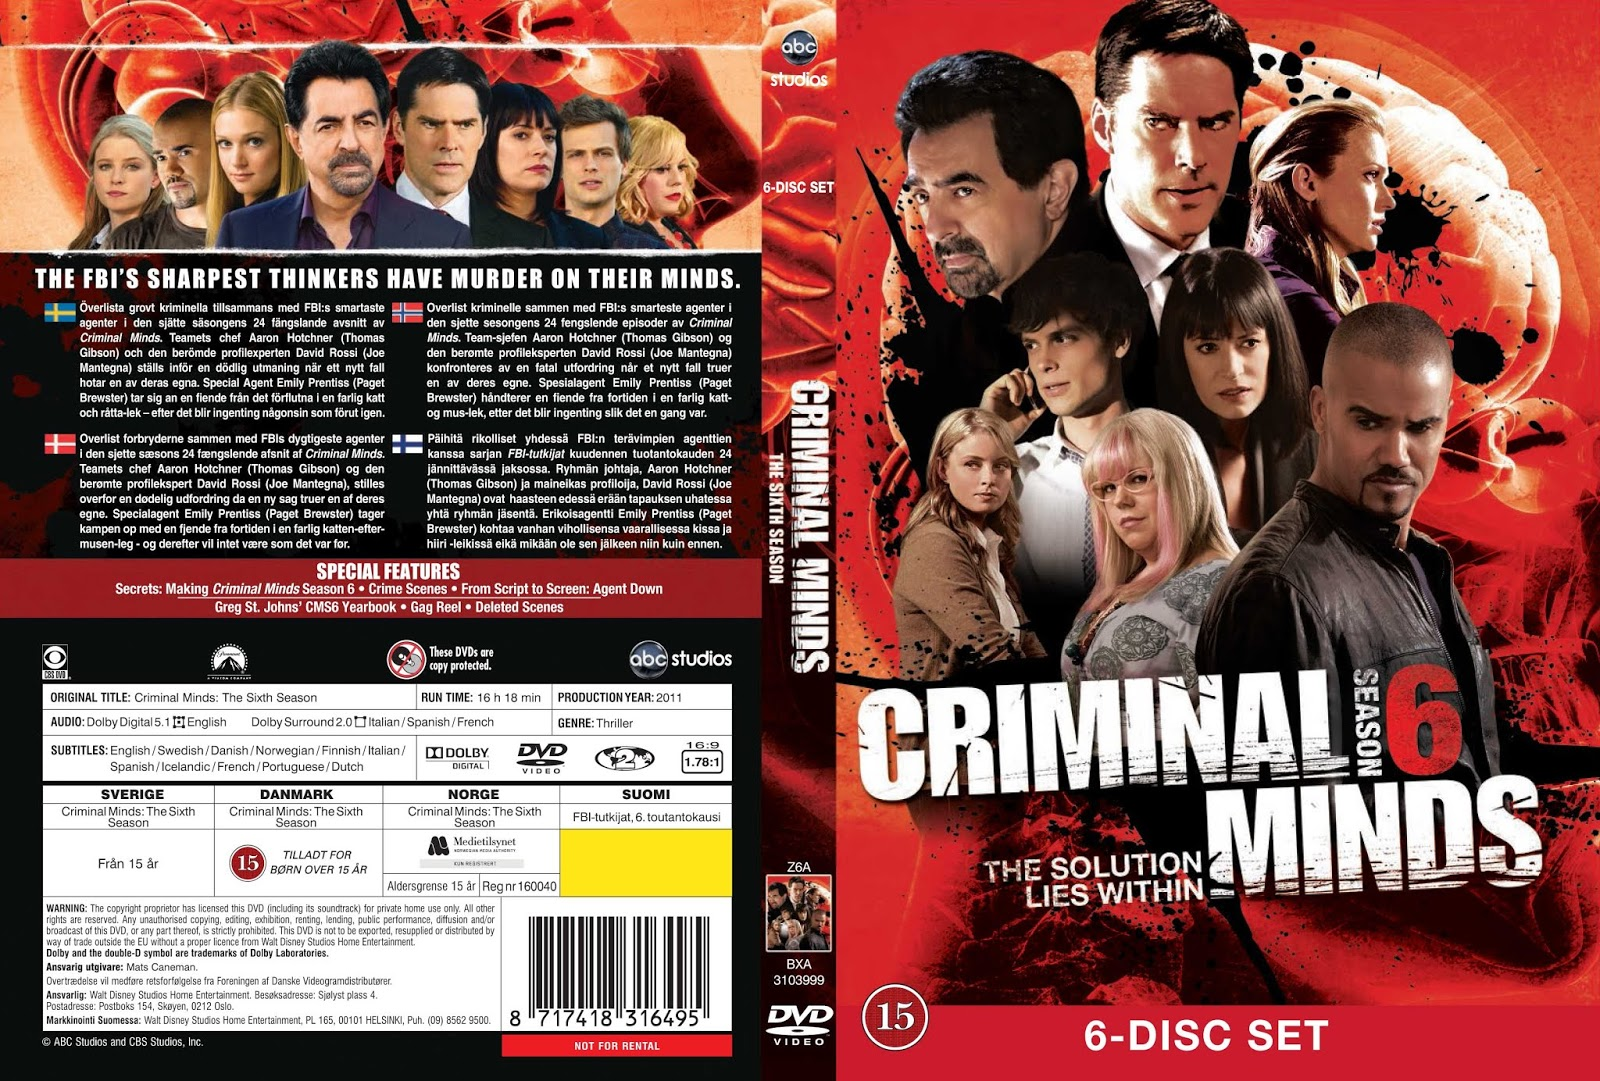 Criminal Minds Season 6 ทีมแกร่งเด็ดขั้วอาชญากรรม ปี 6 ทุกตอน พากย์ไทย